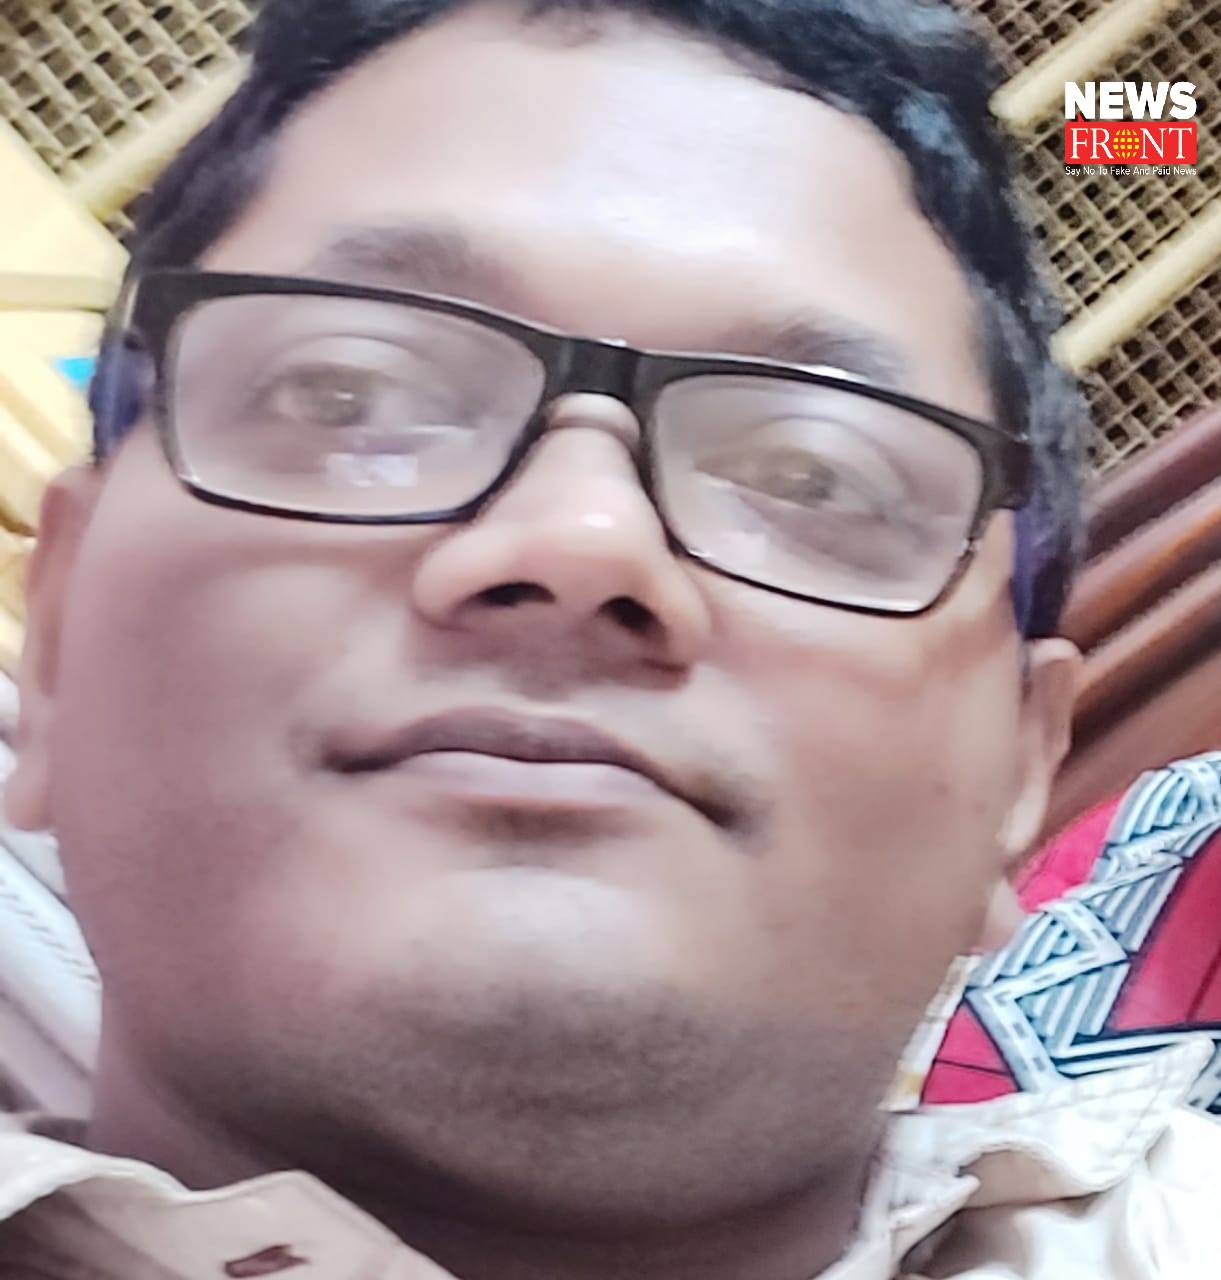 Priyaranjan Karar | newsfront.co